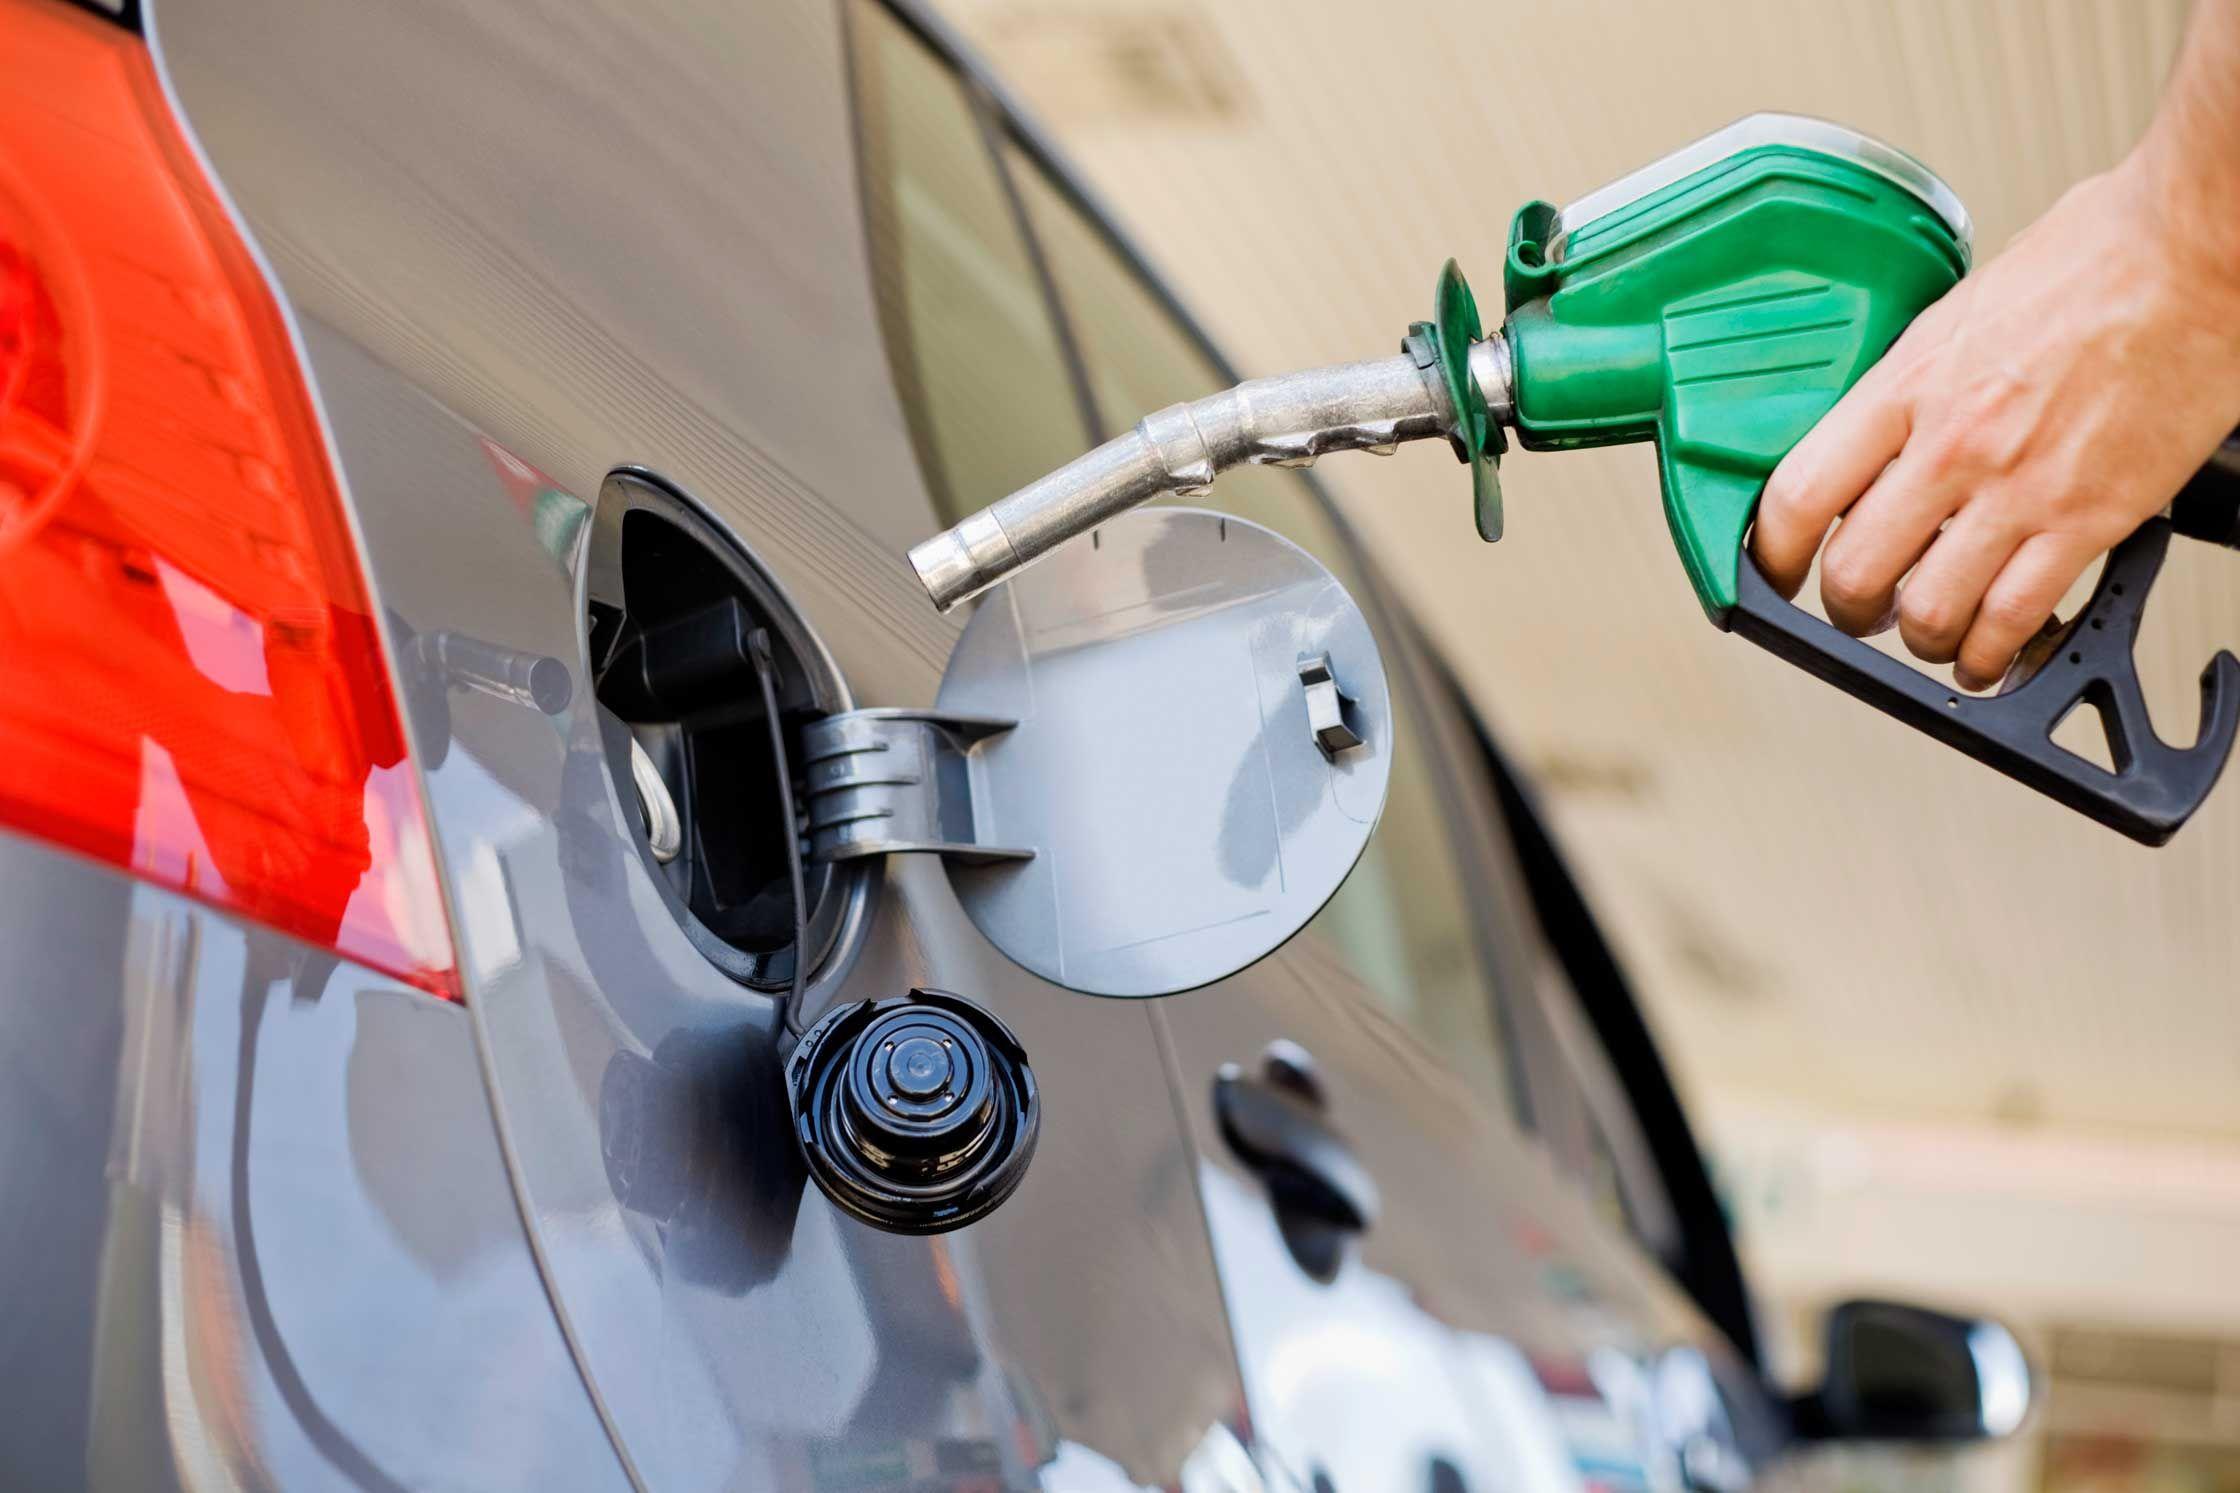 La nafta vuelve a aumentar